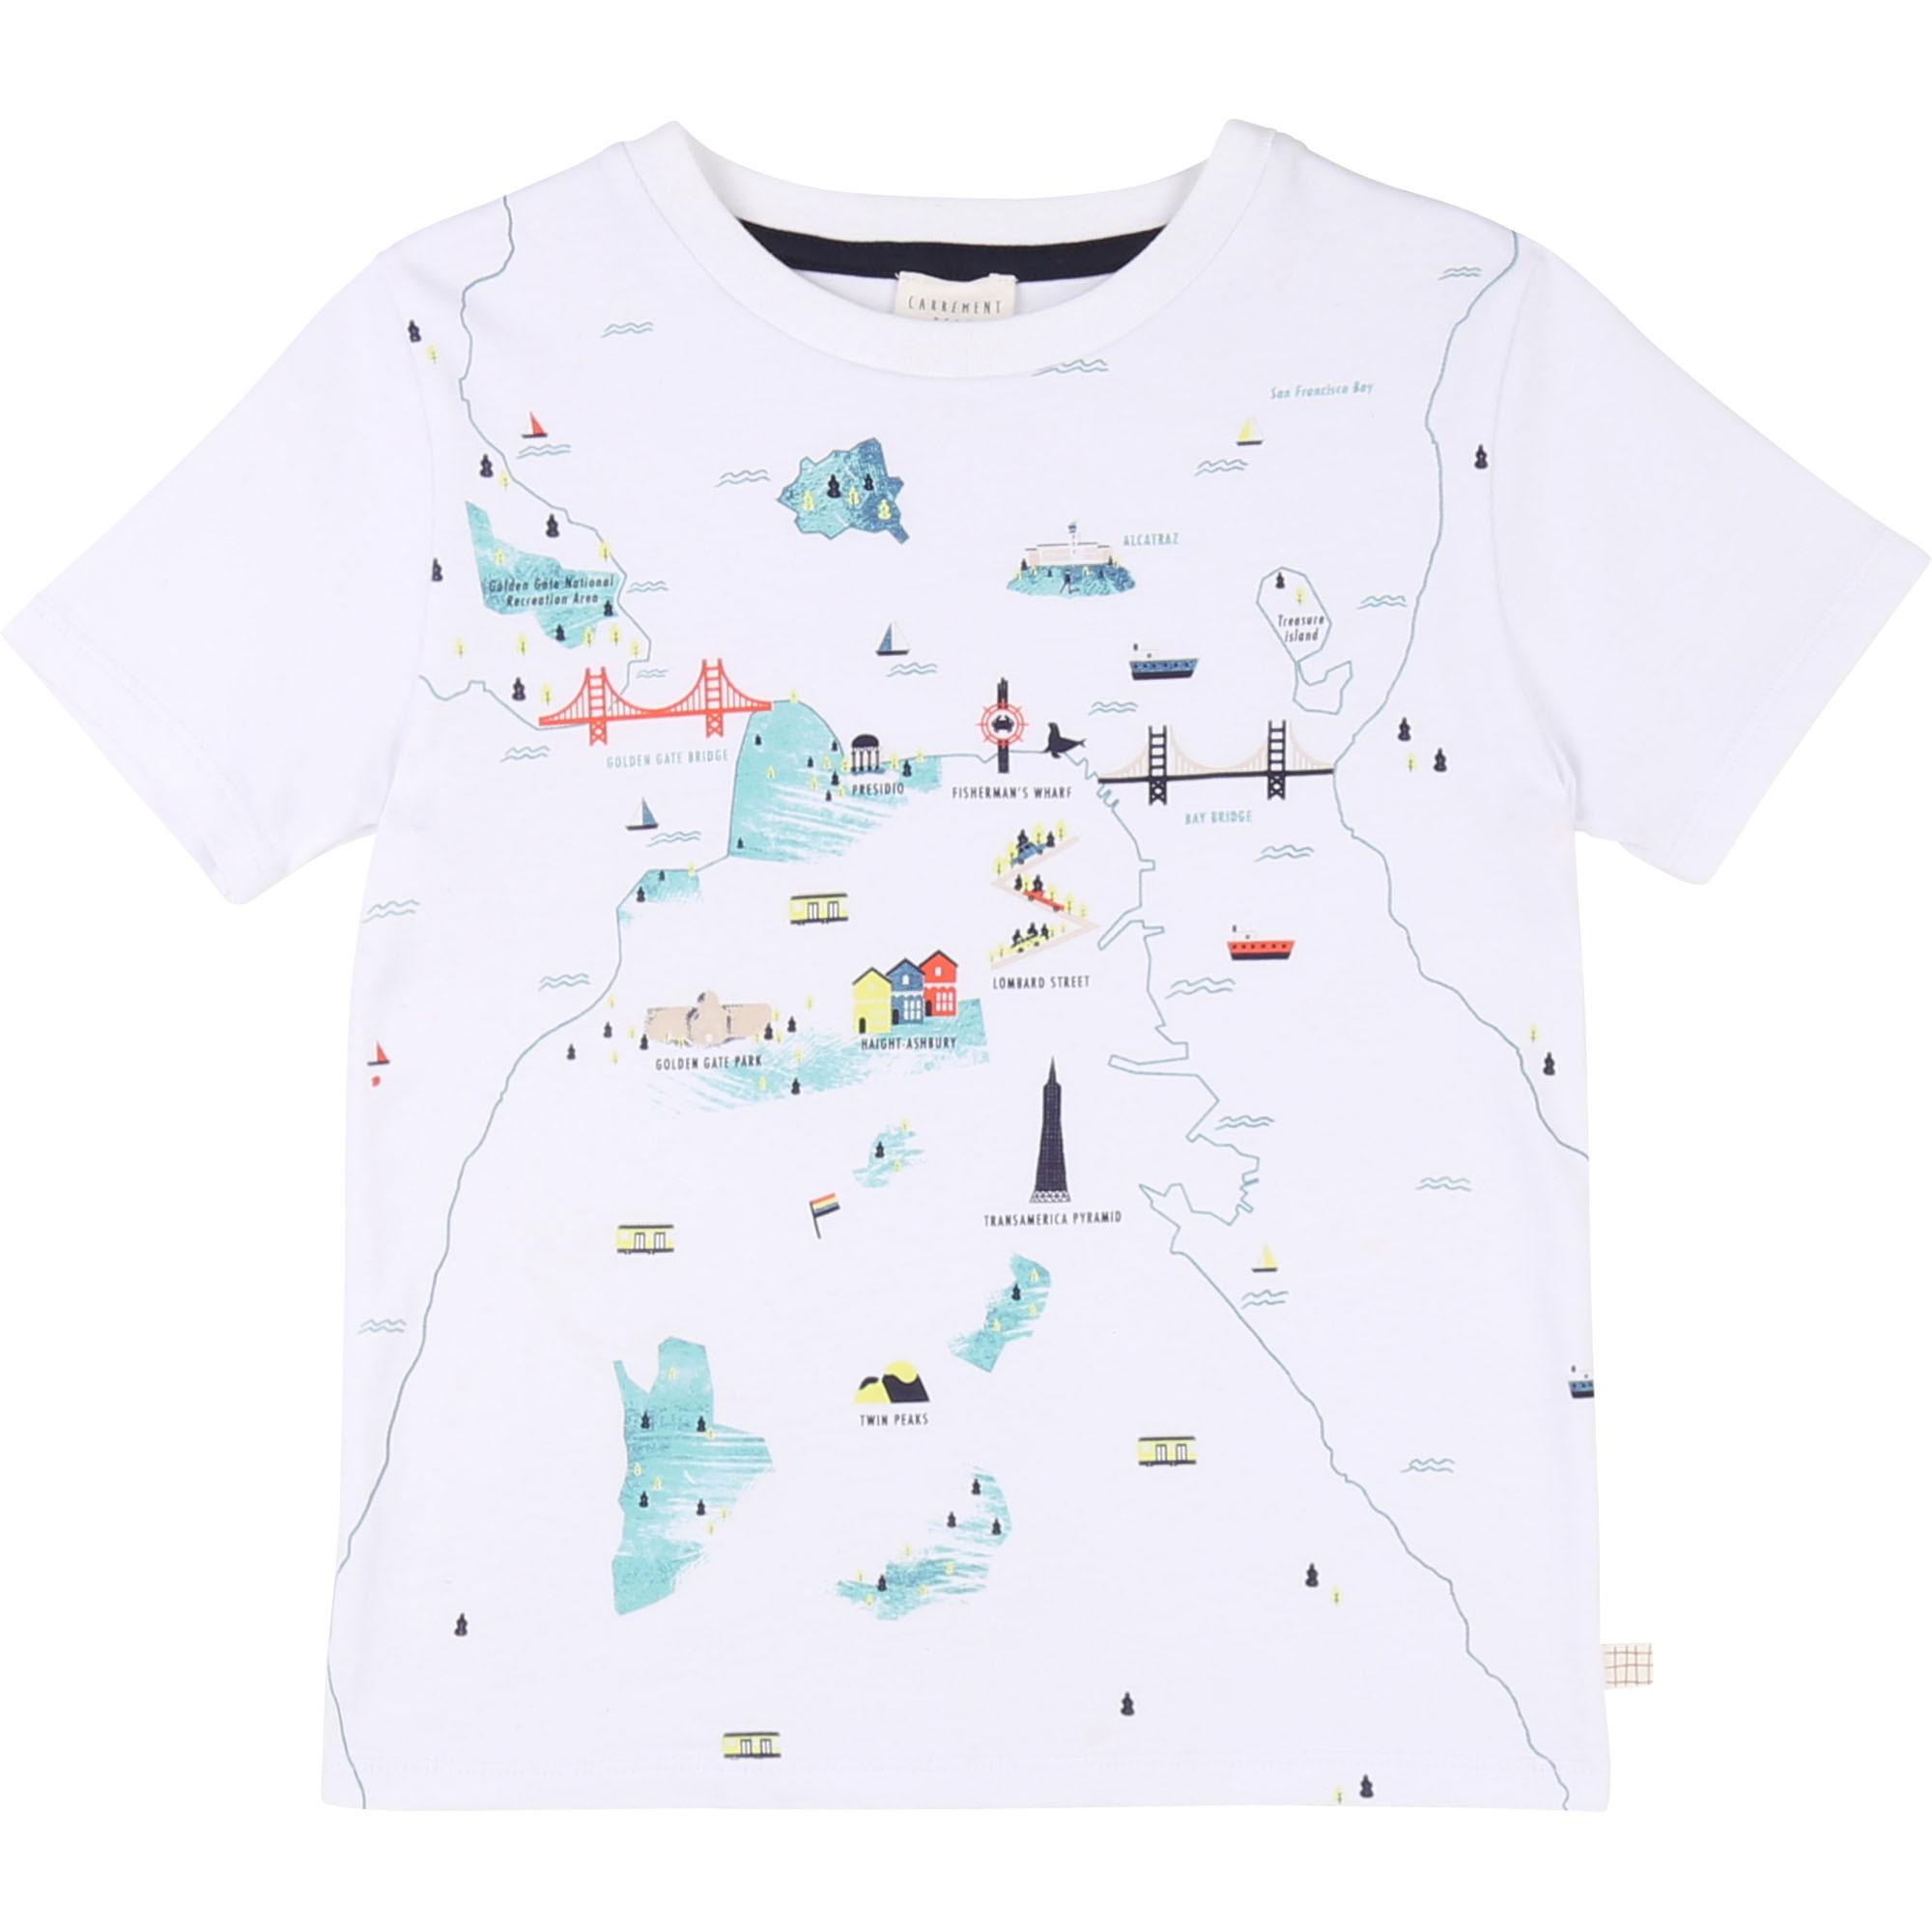 Carrement Beau T-paita koot 108 cm, 114cm ja 138 cm ALE -50% (OVH 25€)